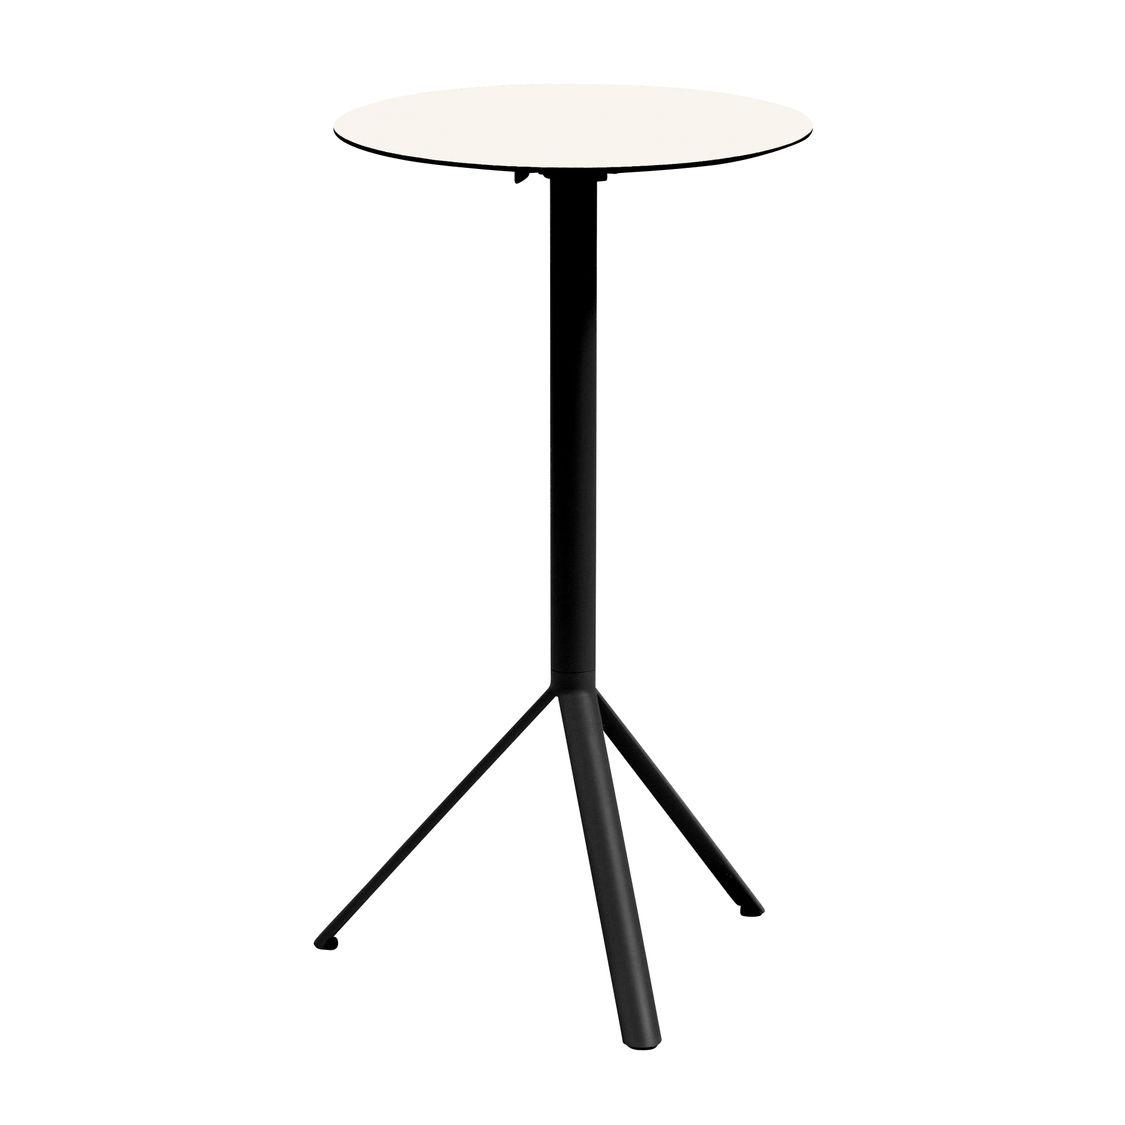 trio table mange debout pliable weish upl. Black Bedroom Furniture Sets. Home Design Ideas